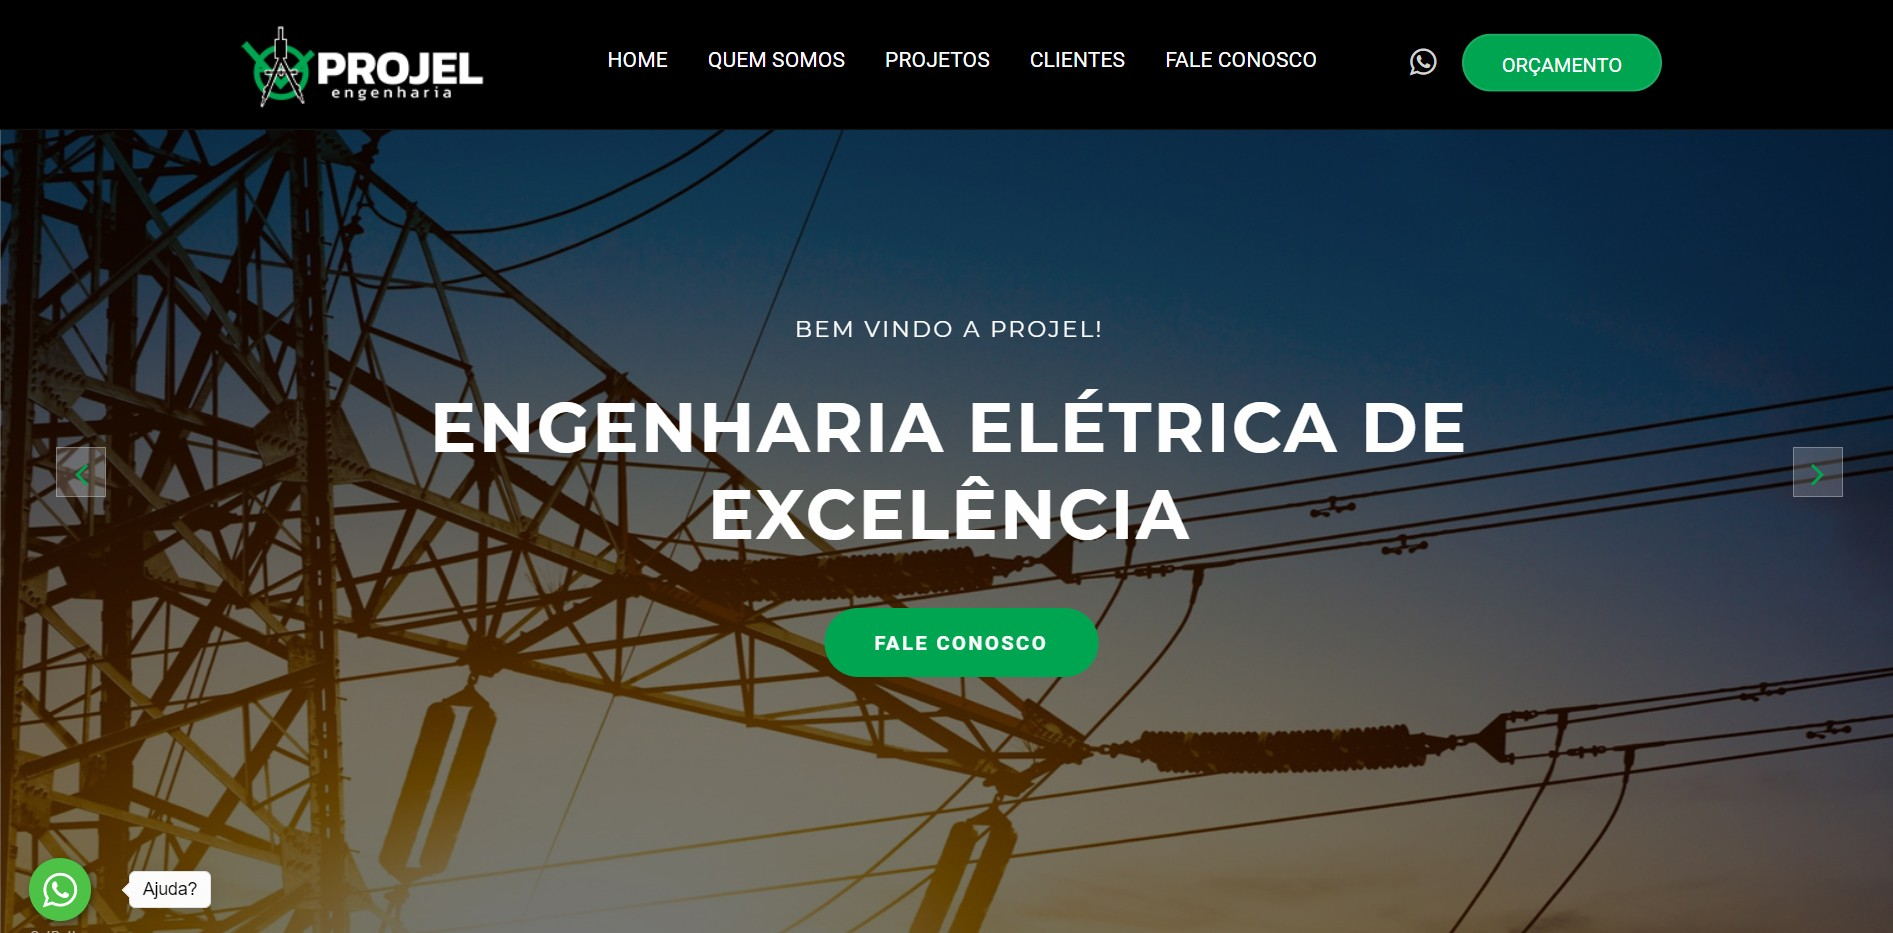 Novo Projeto Web no Ar! Projel Sistemas Elétricos